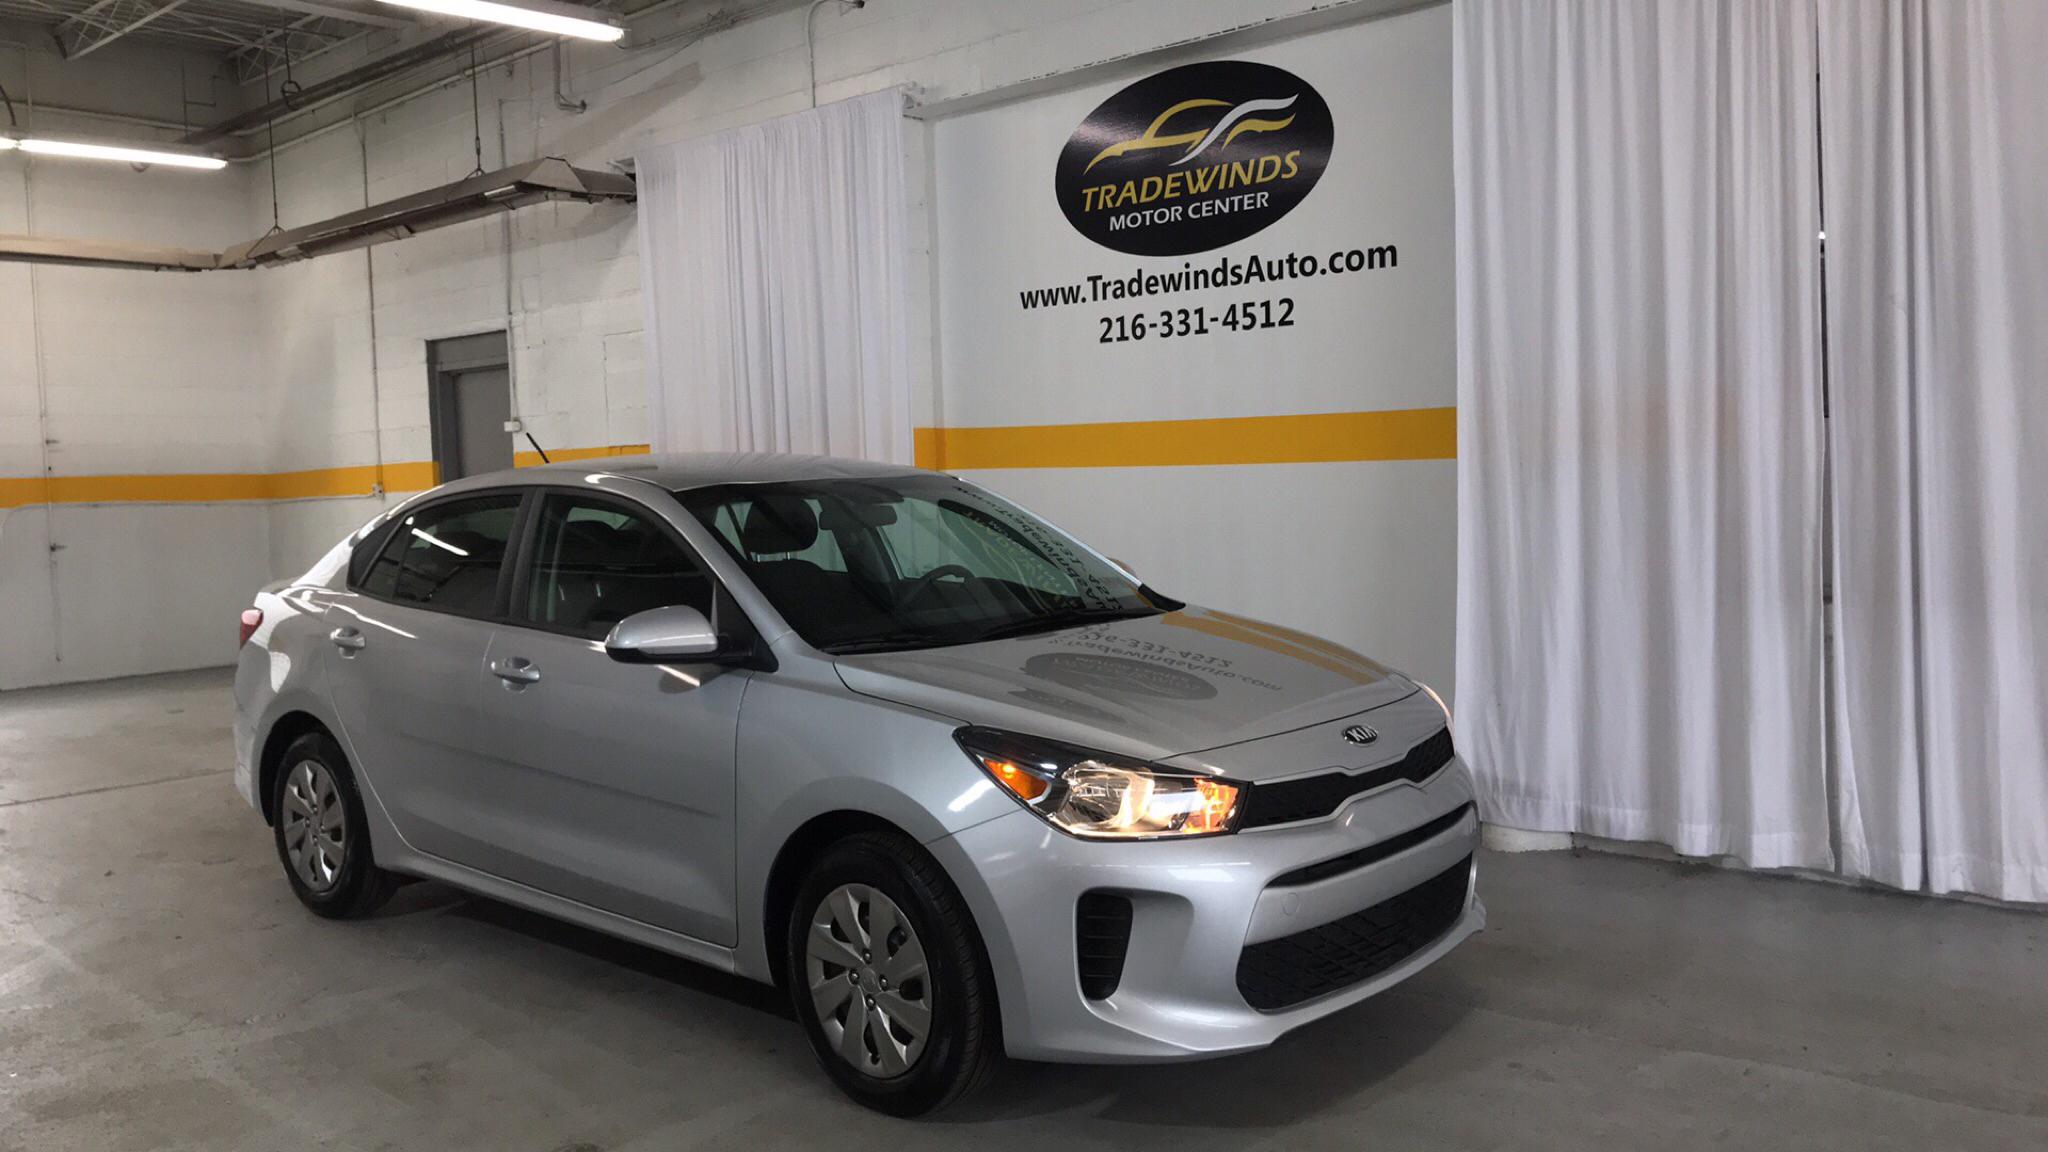 2018 KIA RIO S for sale at Tradewinds Motor Center